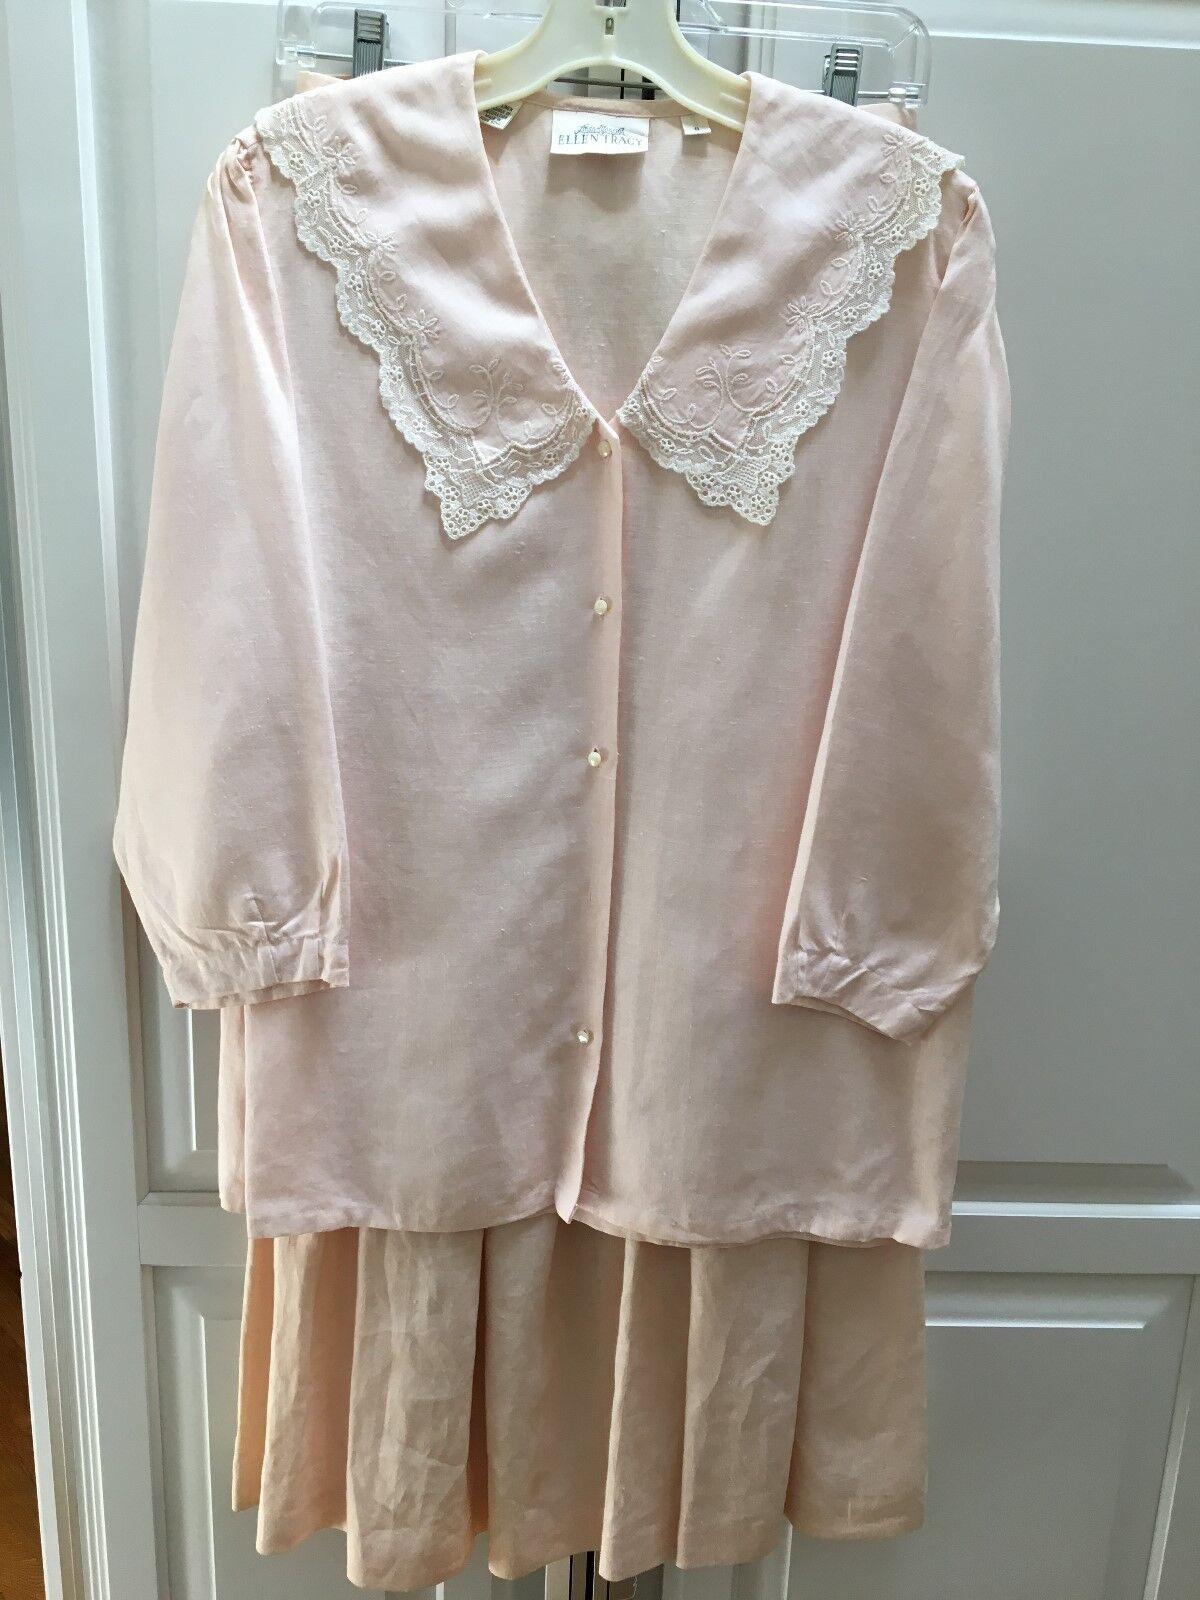 LINDA ALLARD ELLEN TRACY Pink Linen Pleated Skirt and top medium